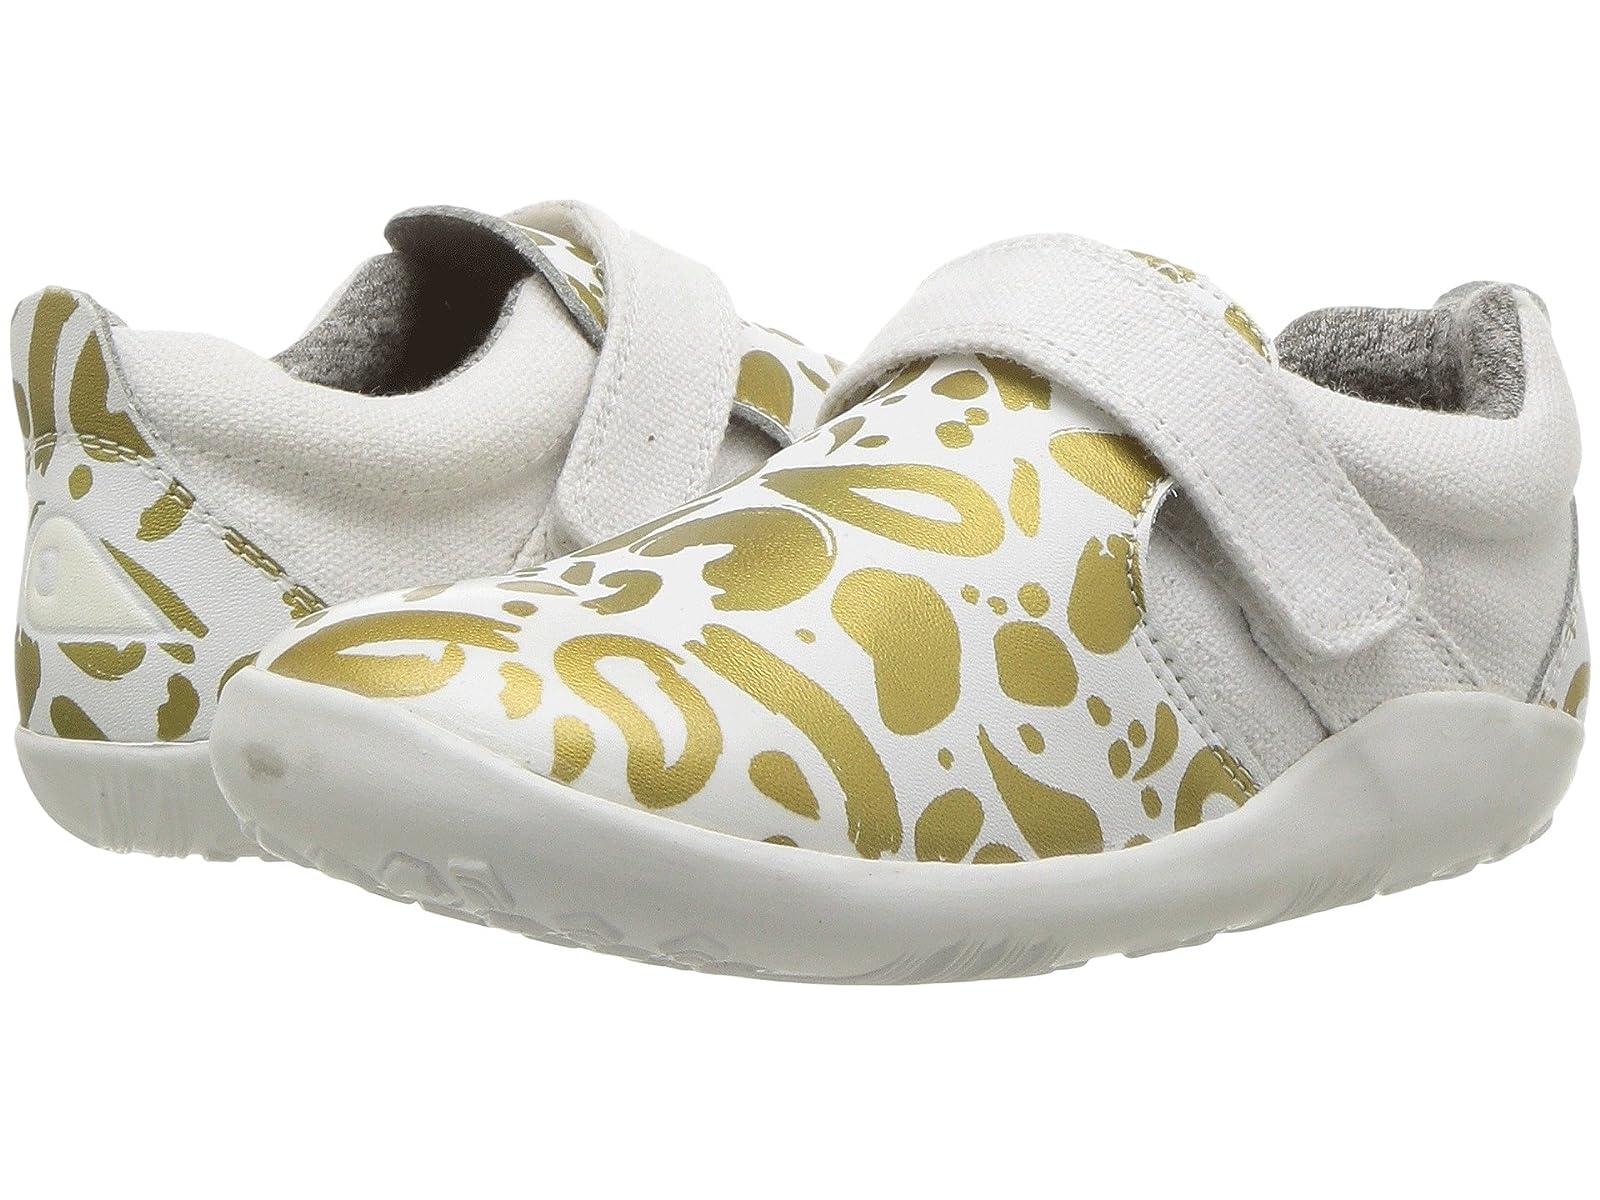 Bobux Kids I-Walk Aktiv Abstract (Toddler)Atmospheric grades have affordable shoes